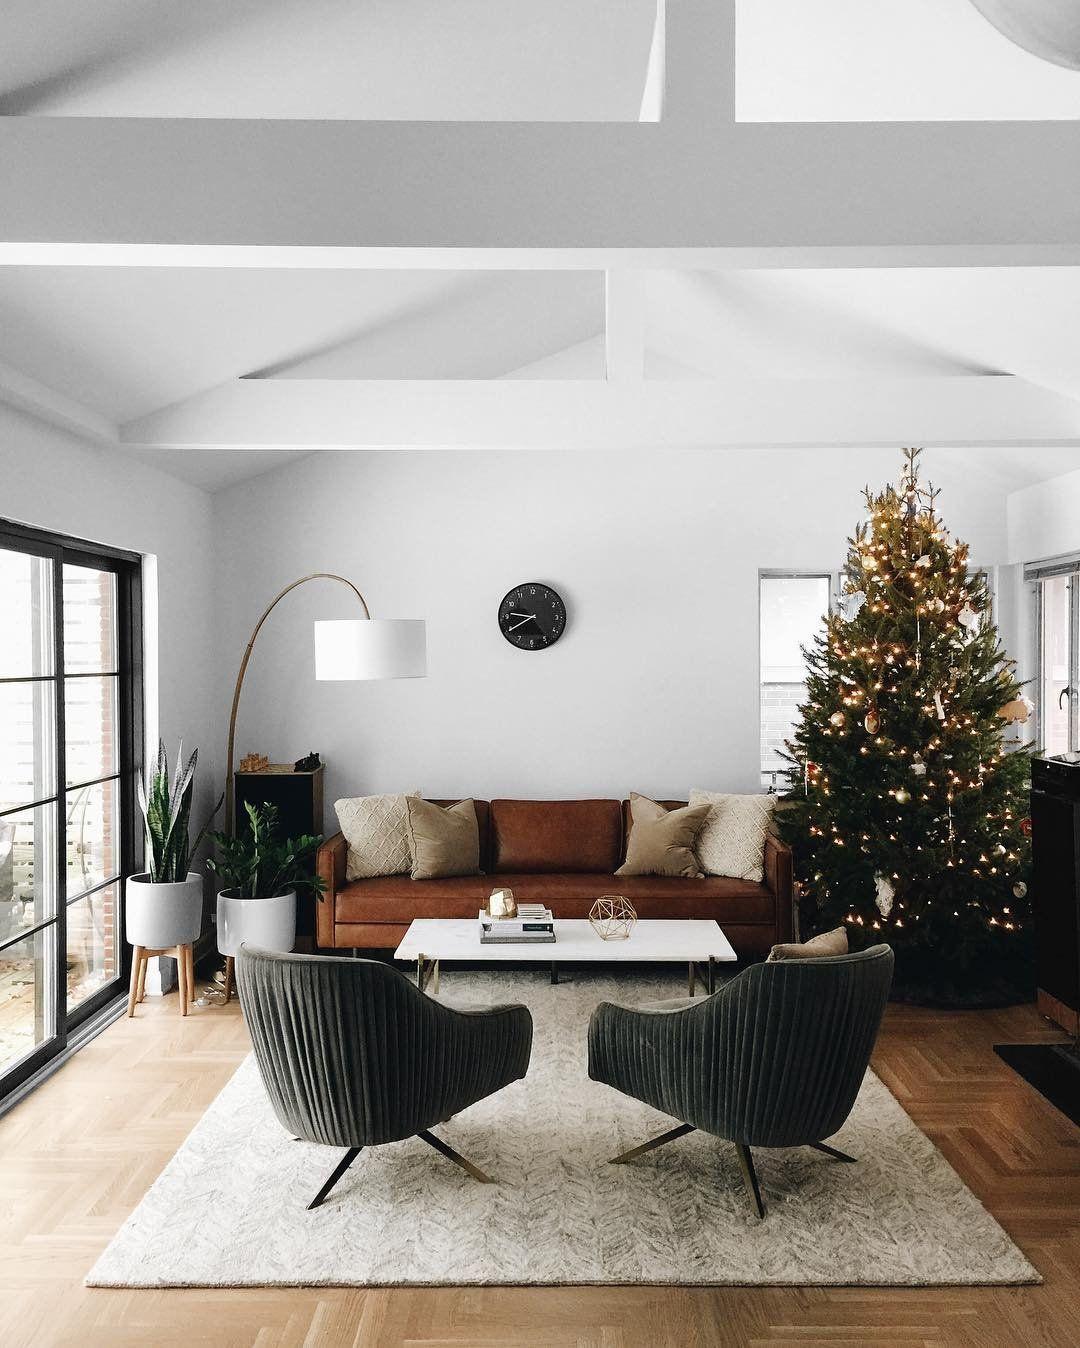 Interior Design Of Living Room Pinlulu 🌺 On Interior Design  Pinterest  Living Rooms